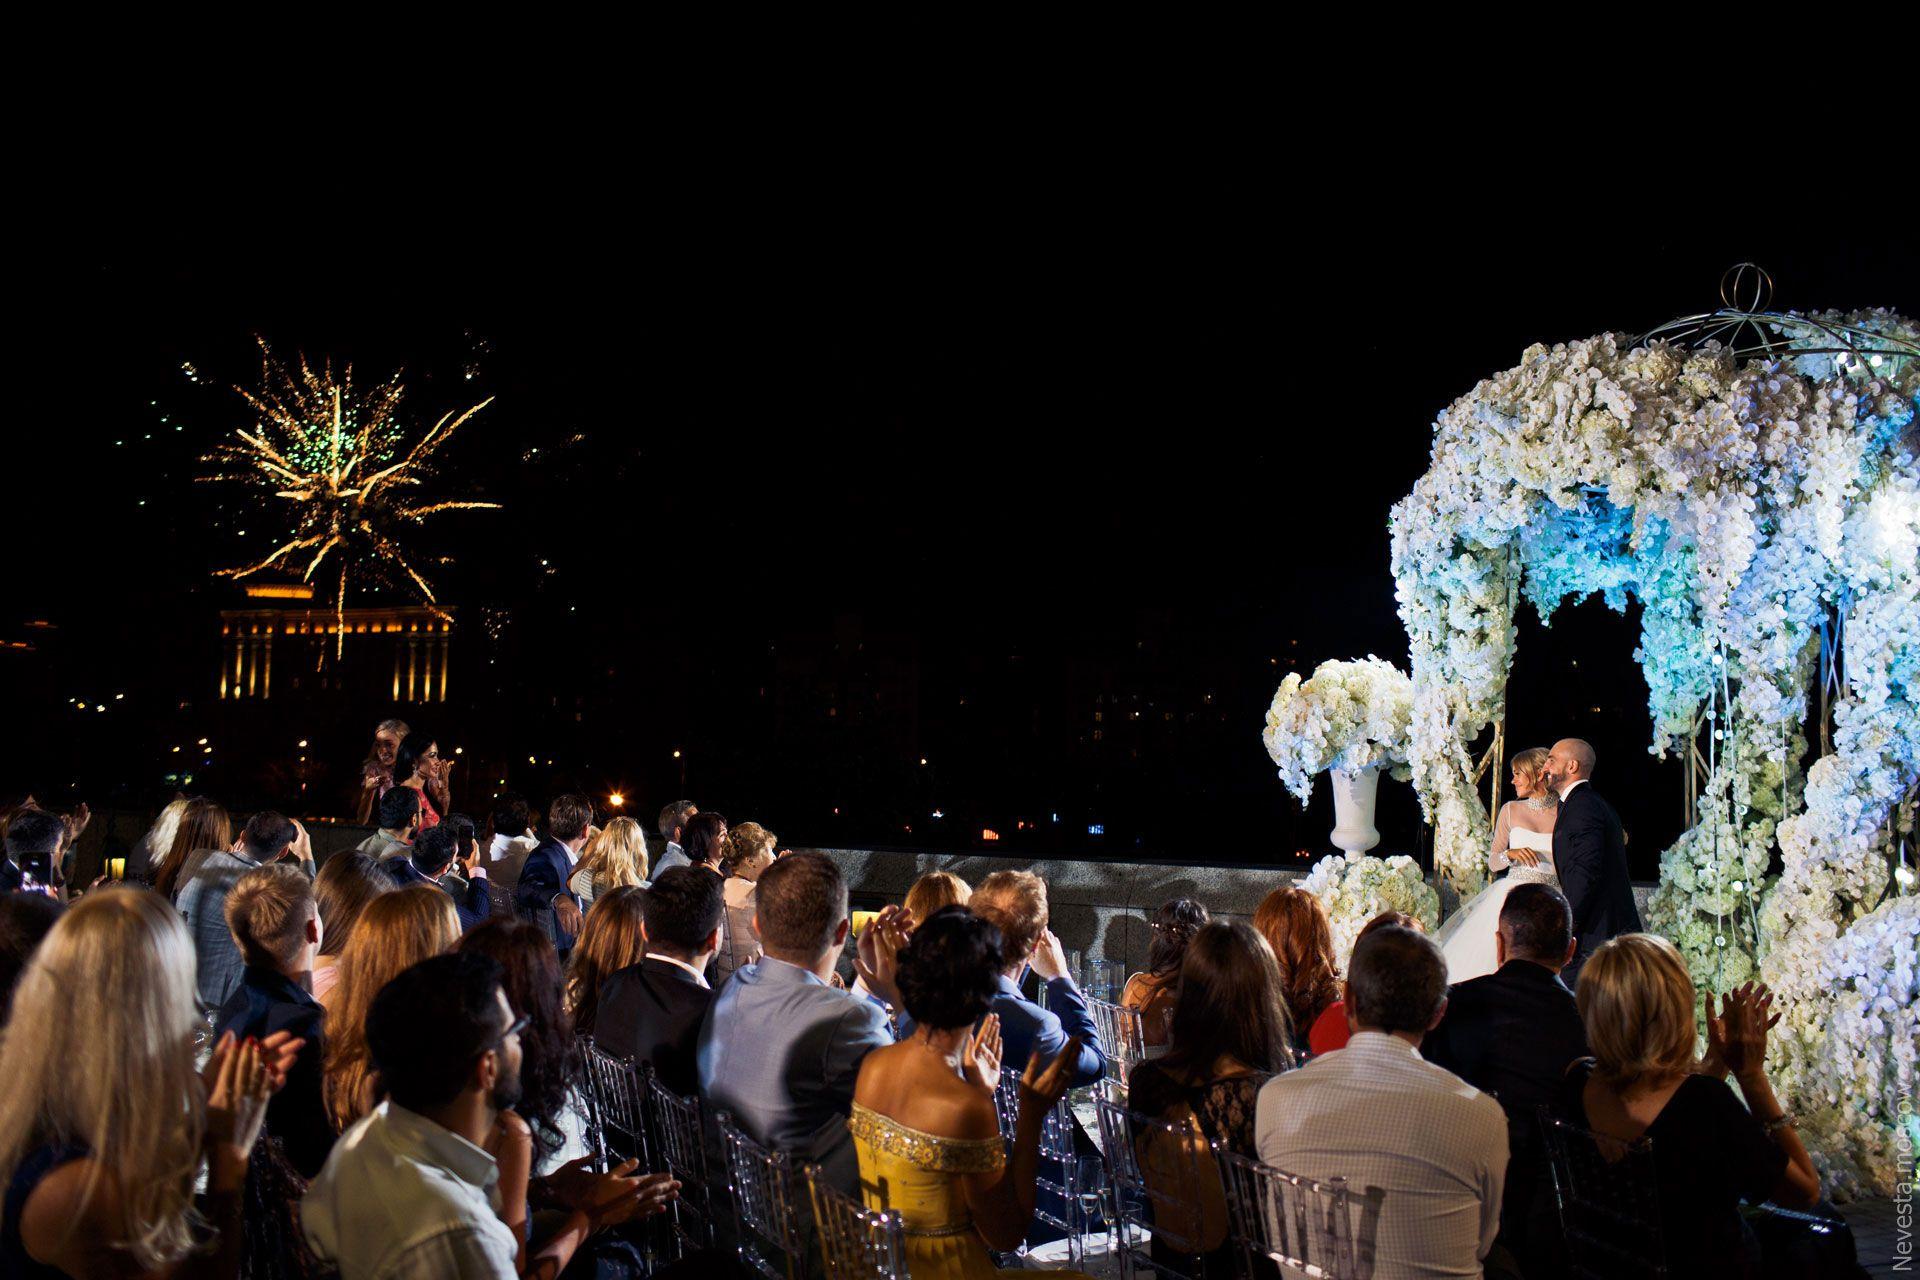 Свадьба Анны Хилькевич и Артура Волкова, фото 17